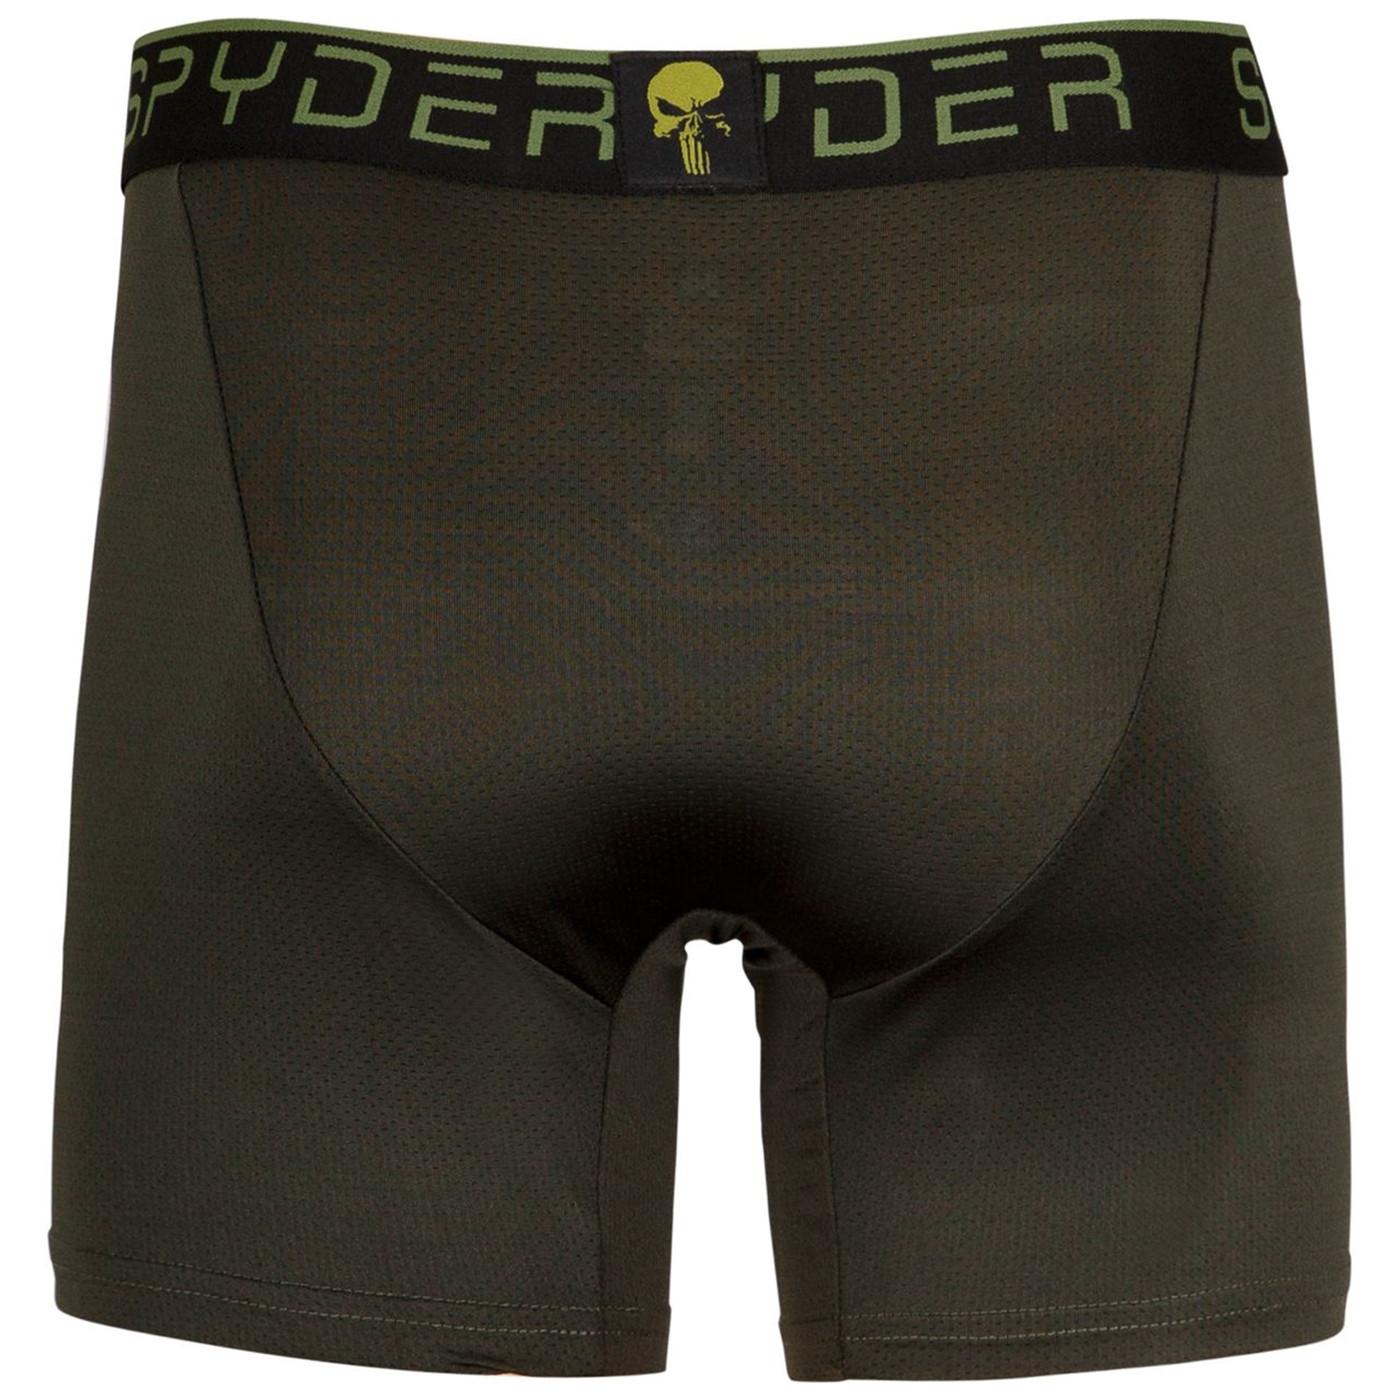 Punisher Spyder Performance Sports Boxer Briefs 3-Pair Pack